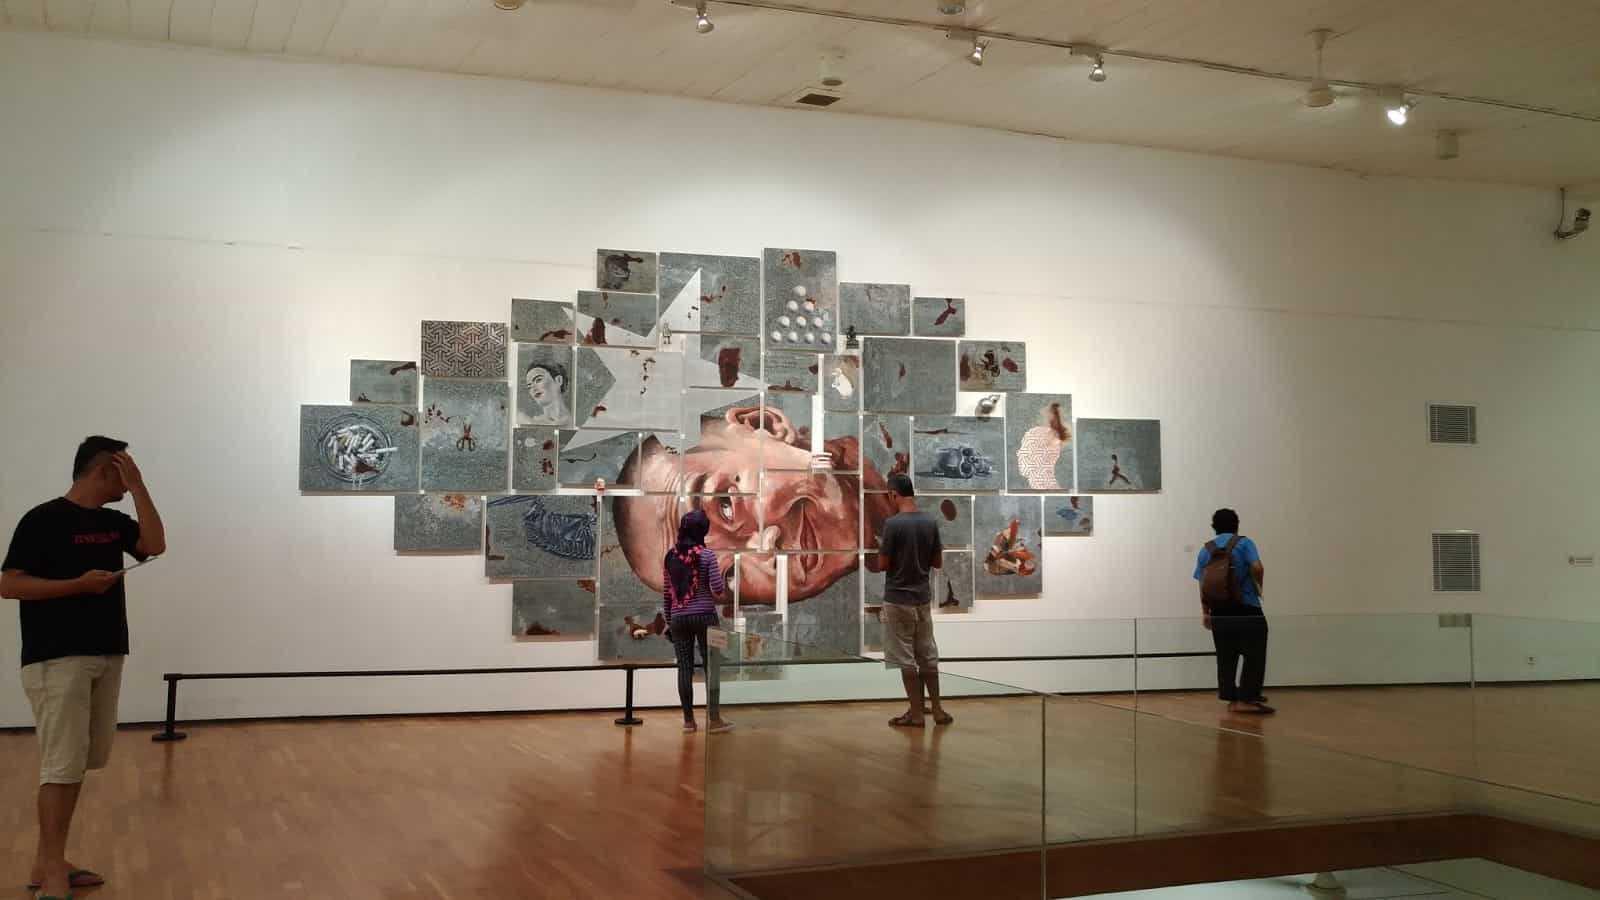 Informasi Lengkap Objek Wisata Semarang Contemporary Art Gallery Karya Museum